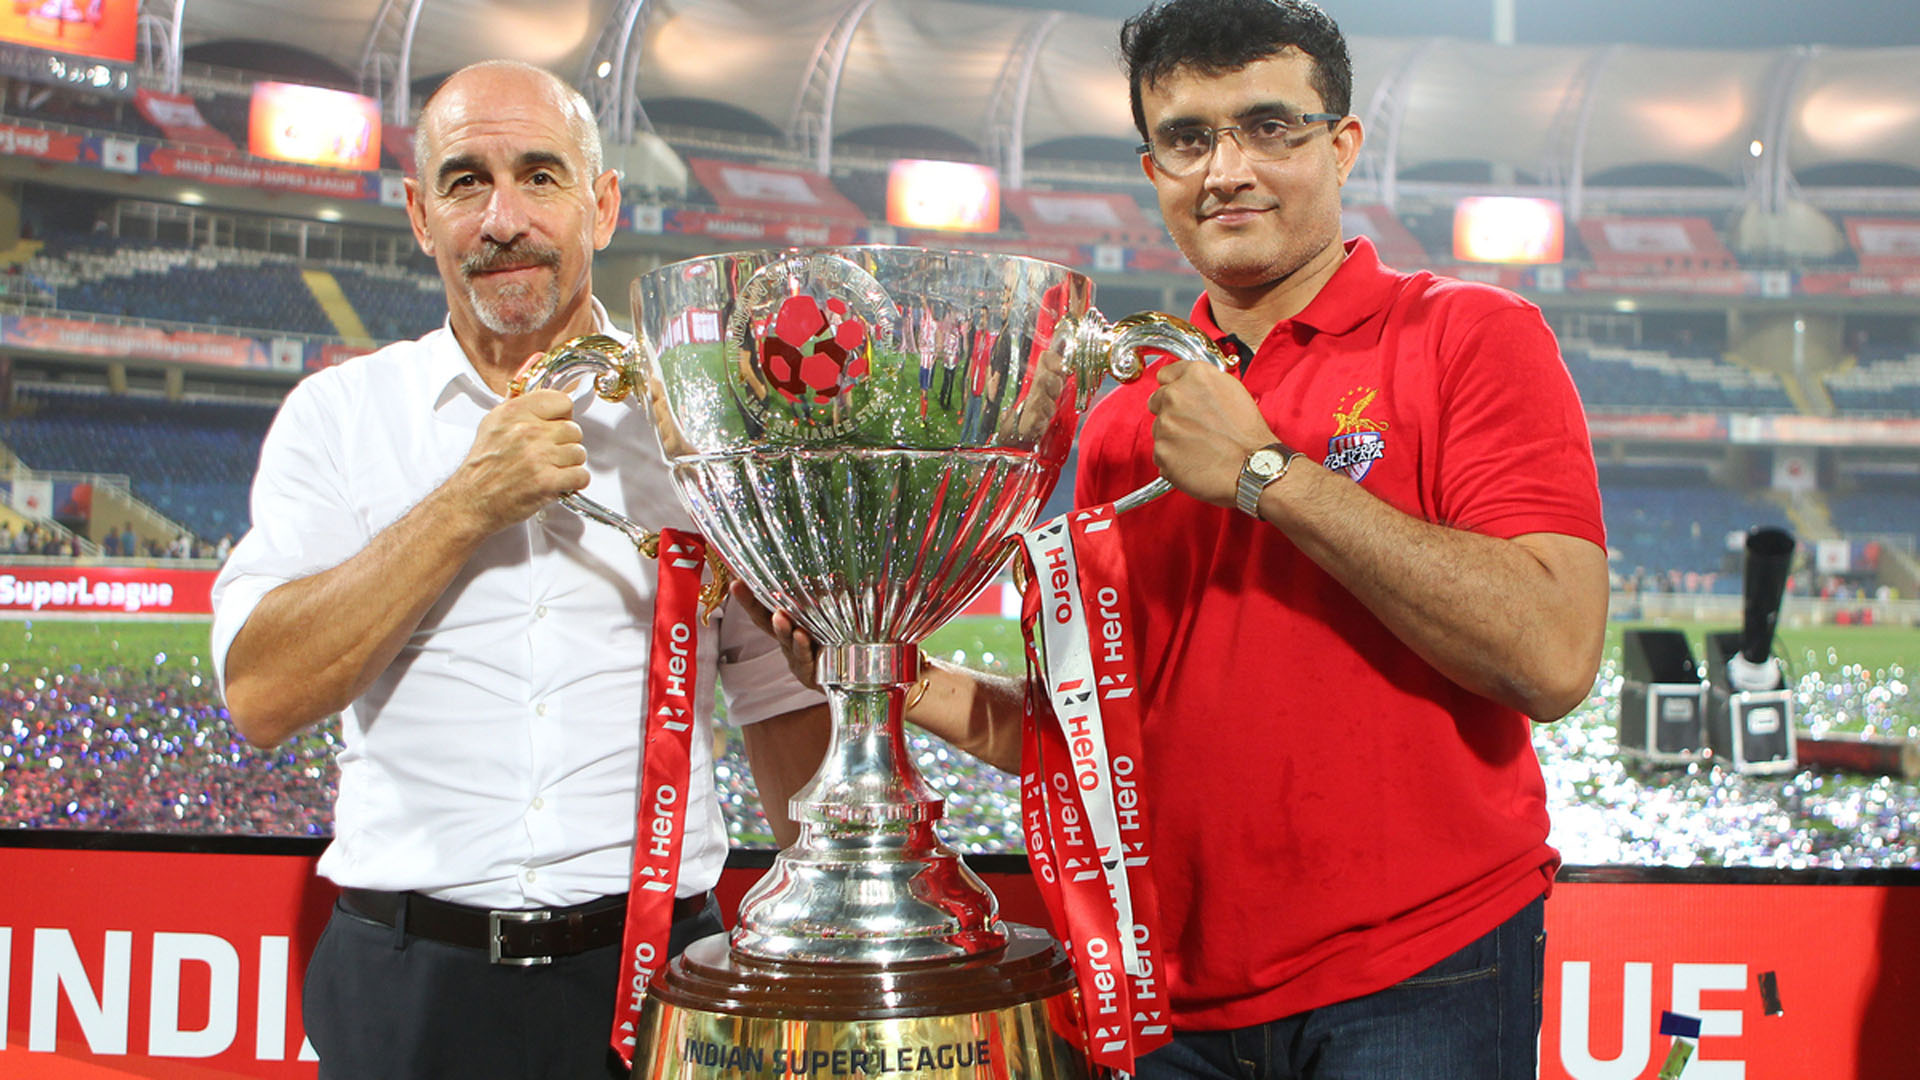 Atletico de Kolkata coach Antonio Lopez Habas and Sourav Ganguly with the ISL trophy